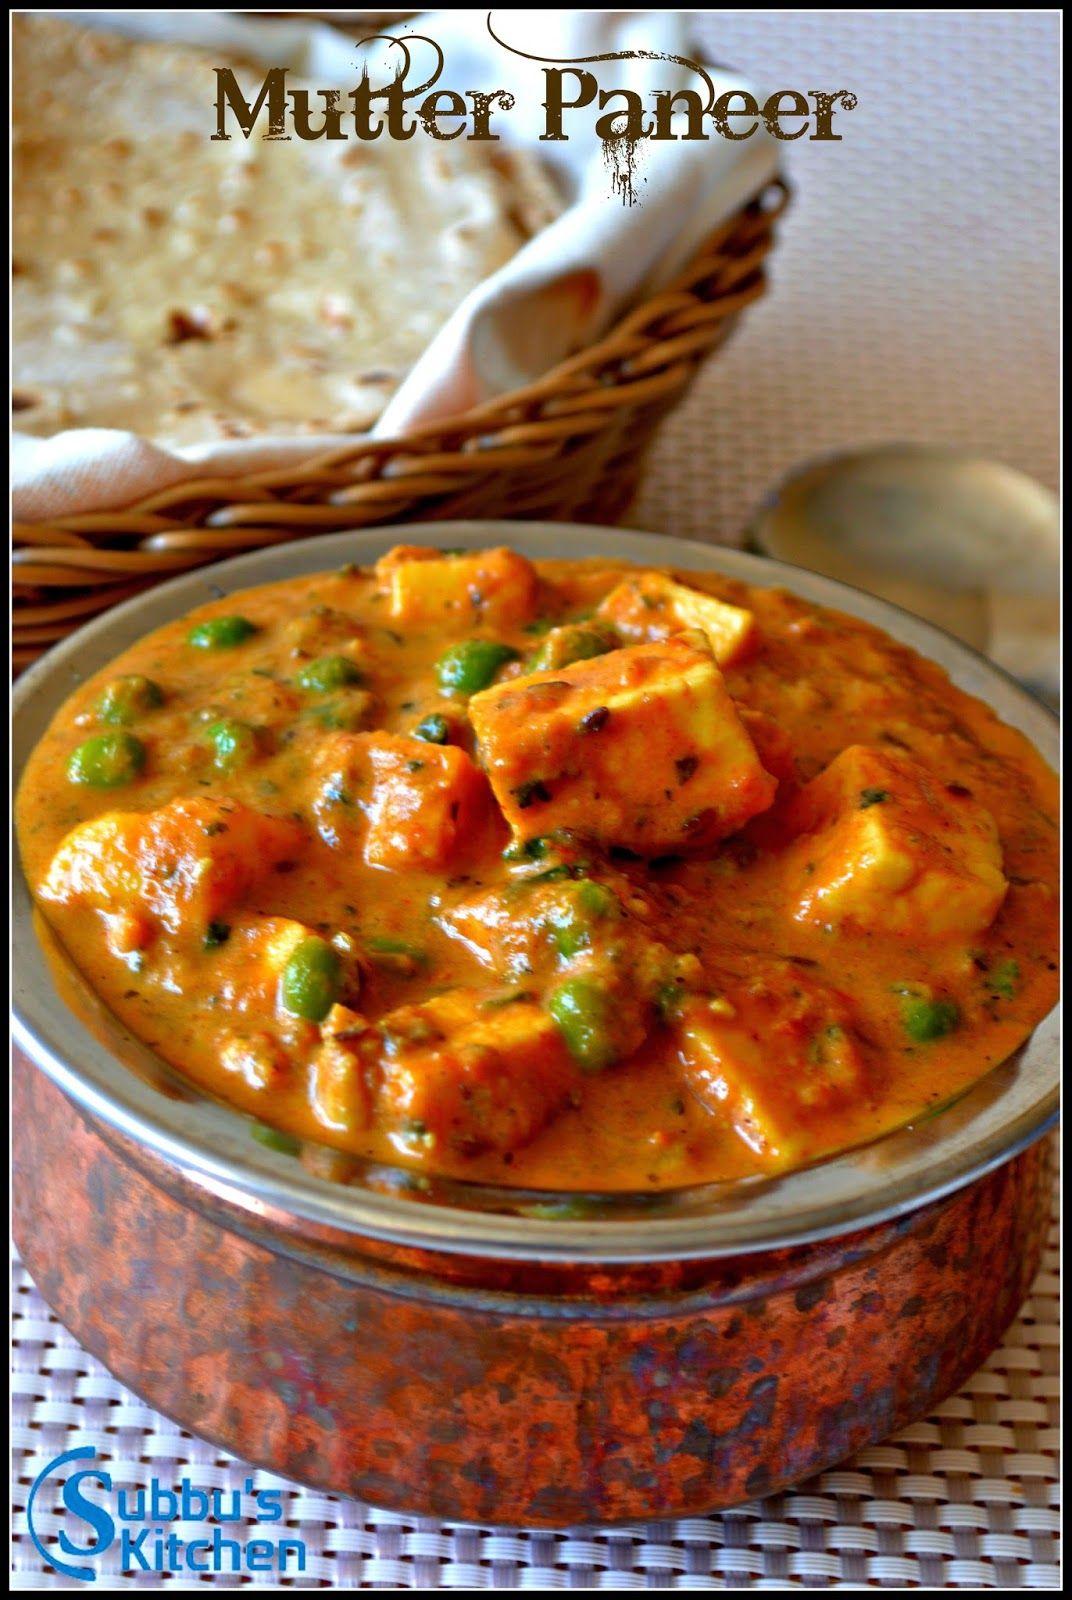 Mutter paneer recipes pinterest mutter paneer foods and recipes explore punjabi recipes punjabi food and more forumfinder Choice Image